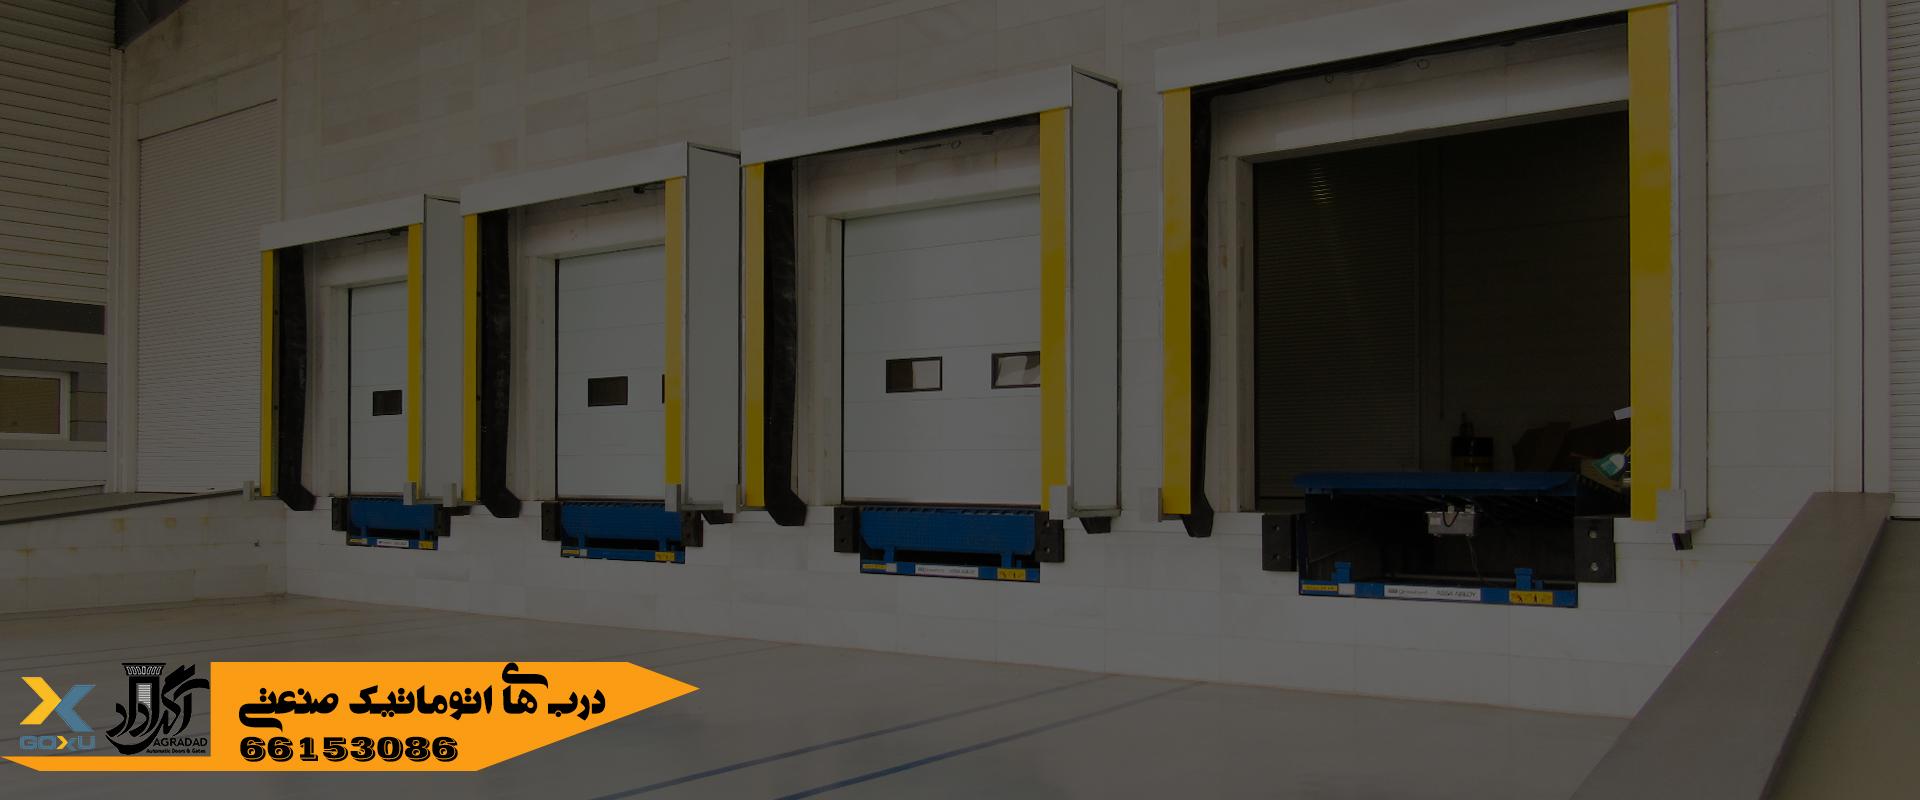 درب اتوماتیک صنعتی,مدل سکشنال( sectional )